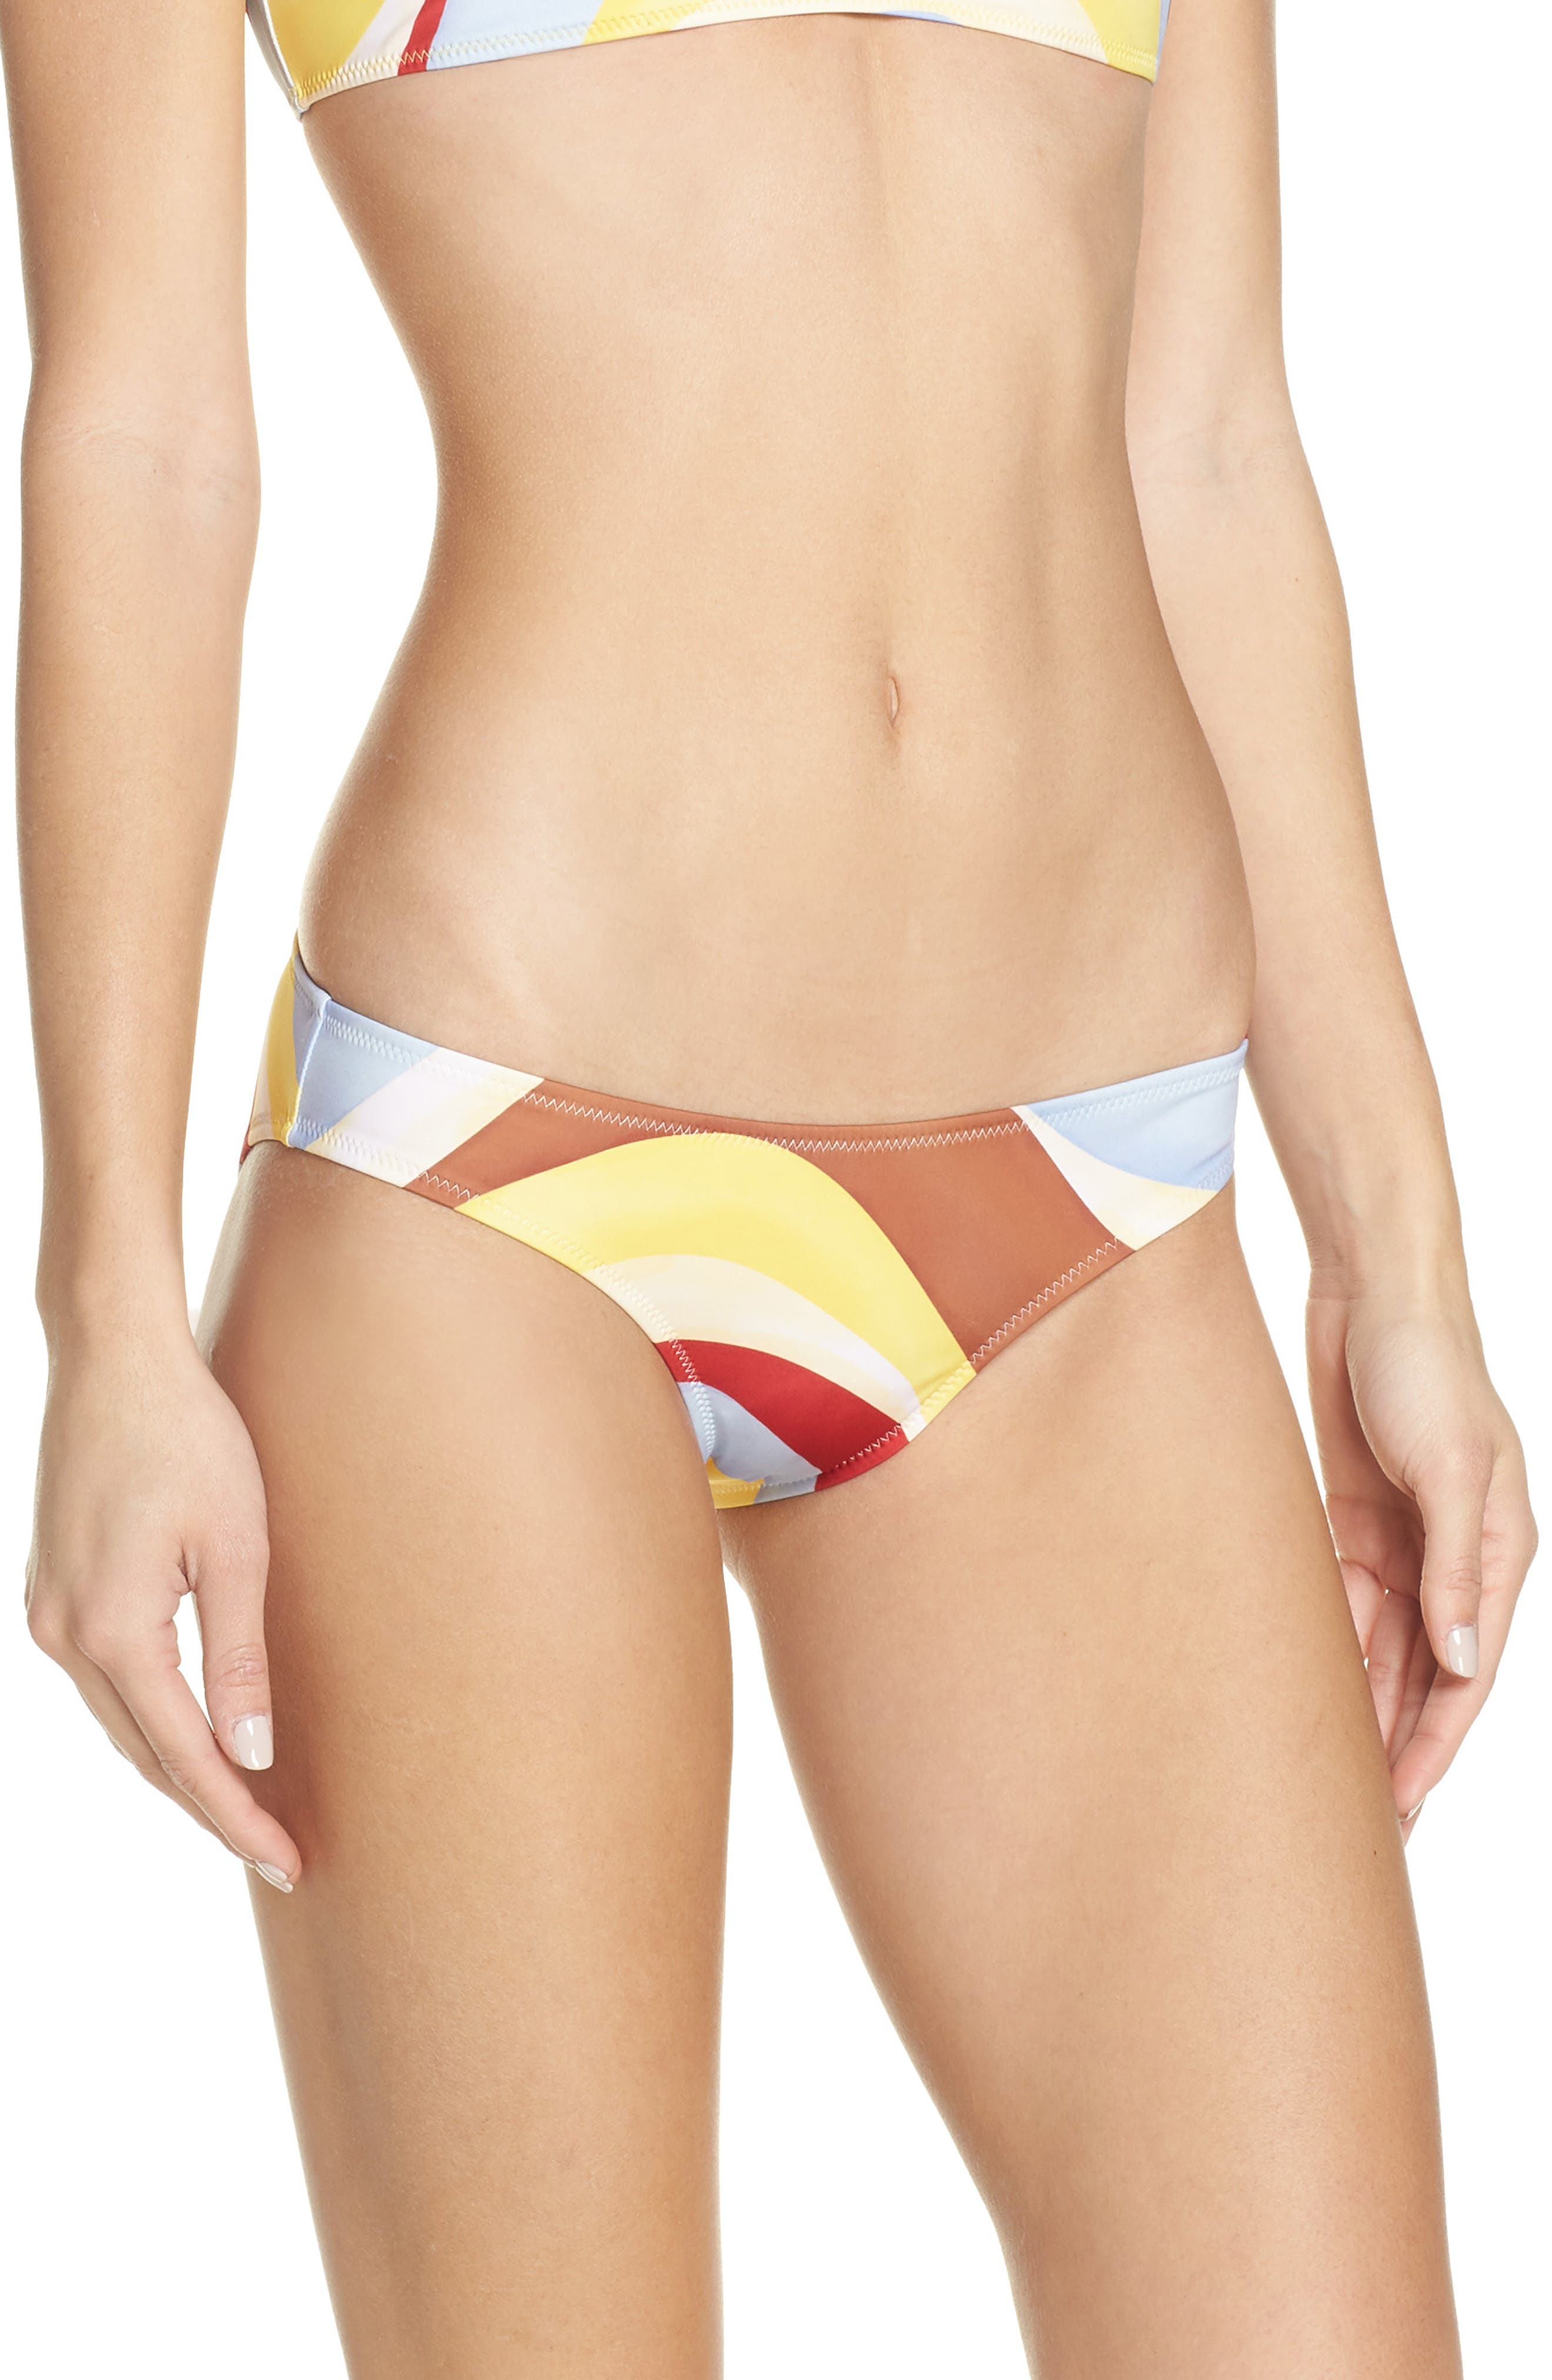 Elle Bikini Bottoms,                             Main thumbnail 1, color,                             408